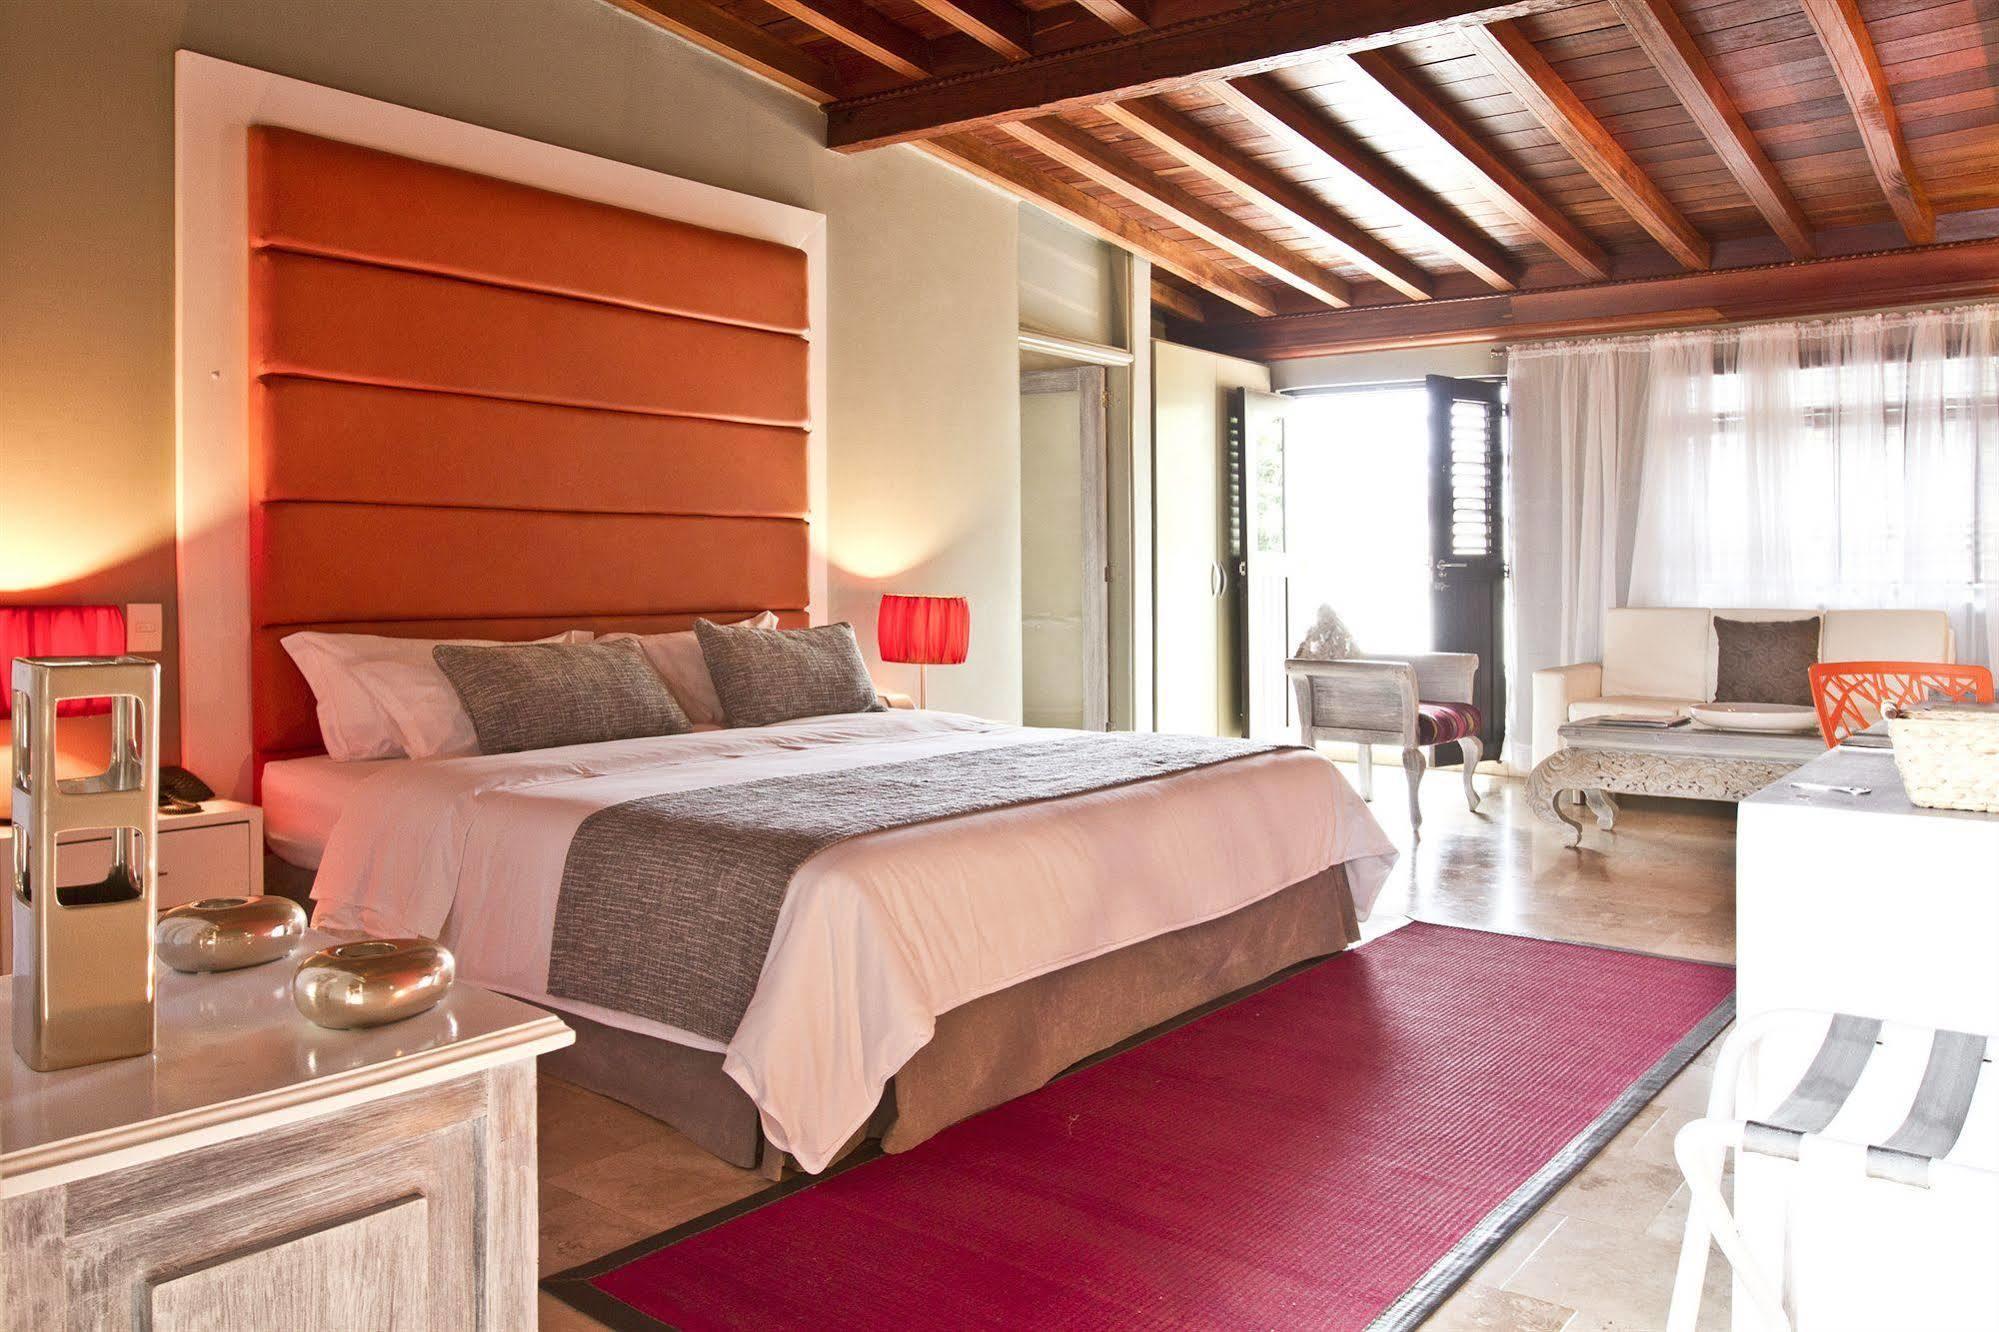 Minibar Kühlschrank Real : Hotel armeria real luxury by faranda cartagena kolumbien ****